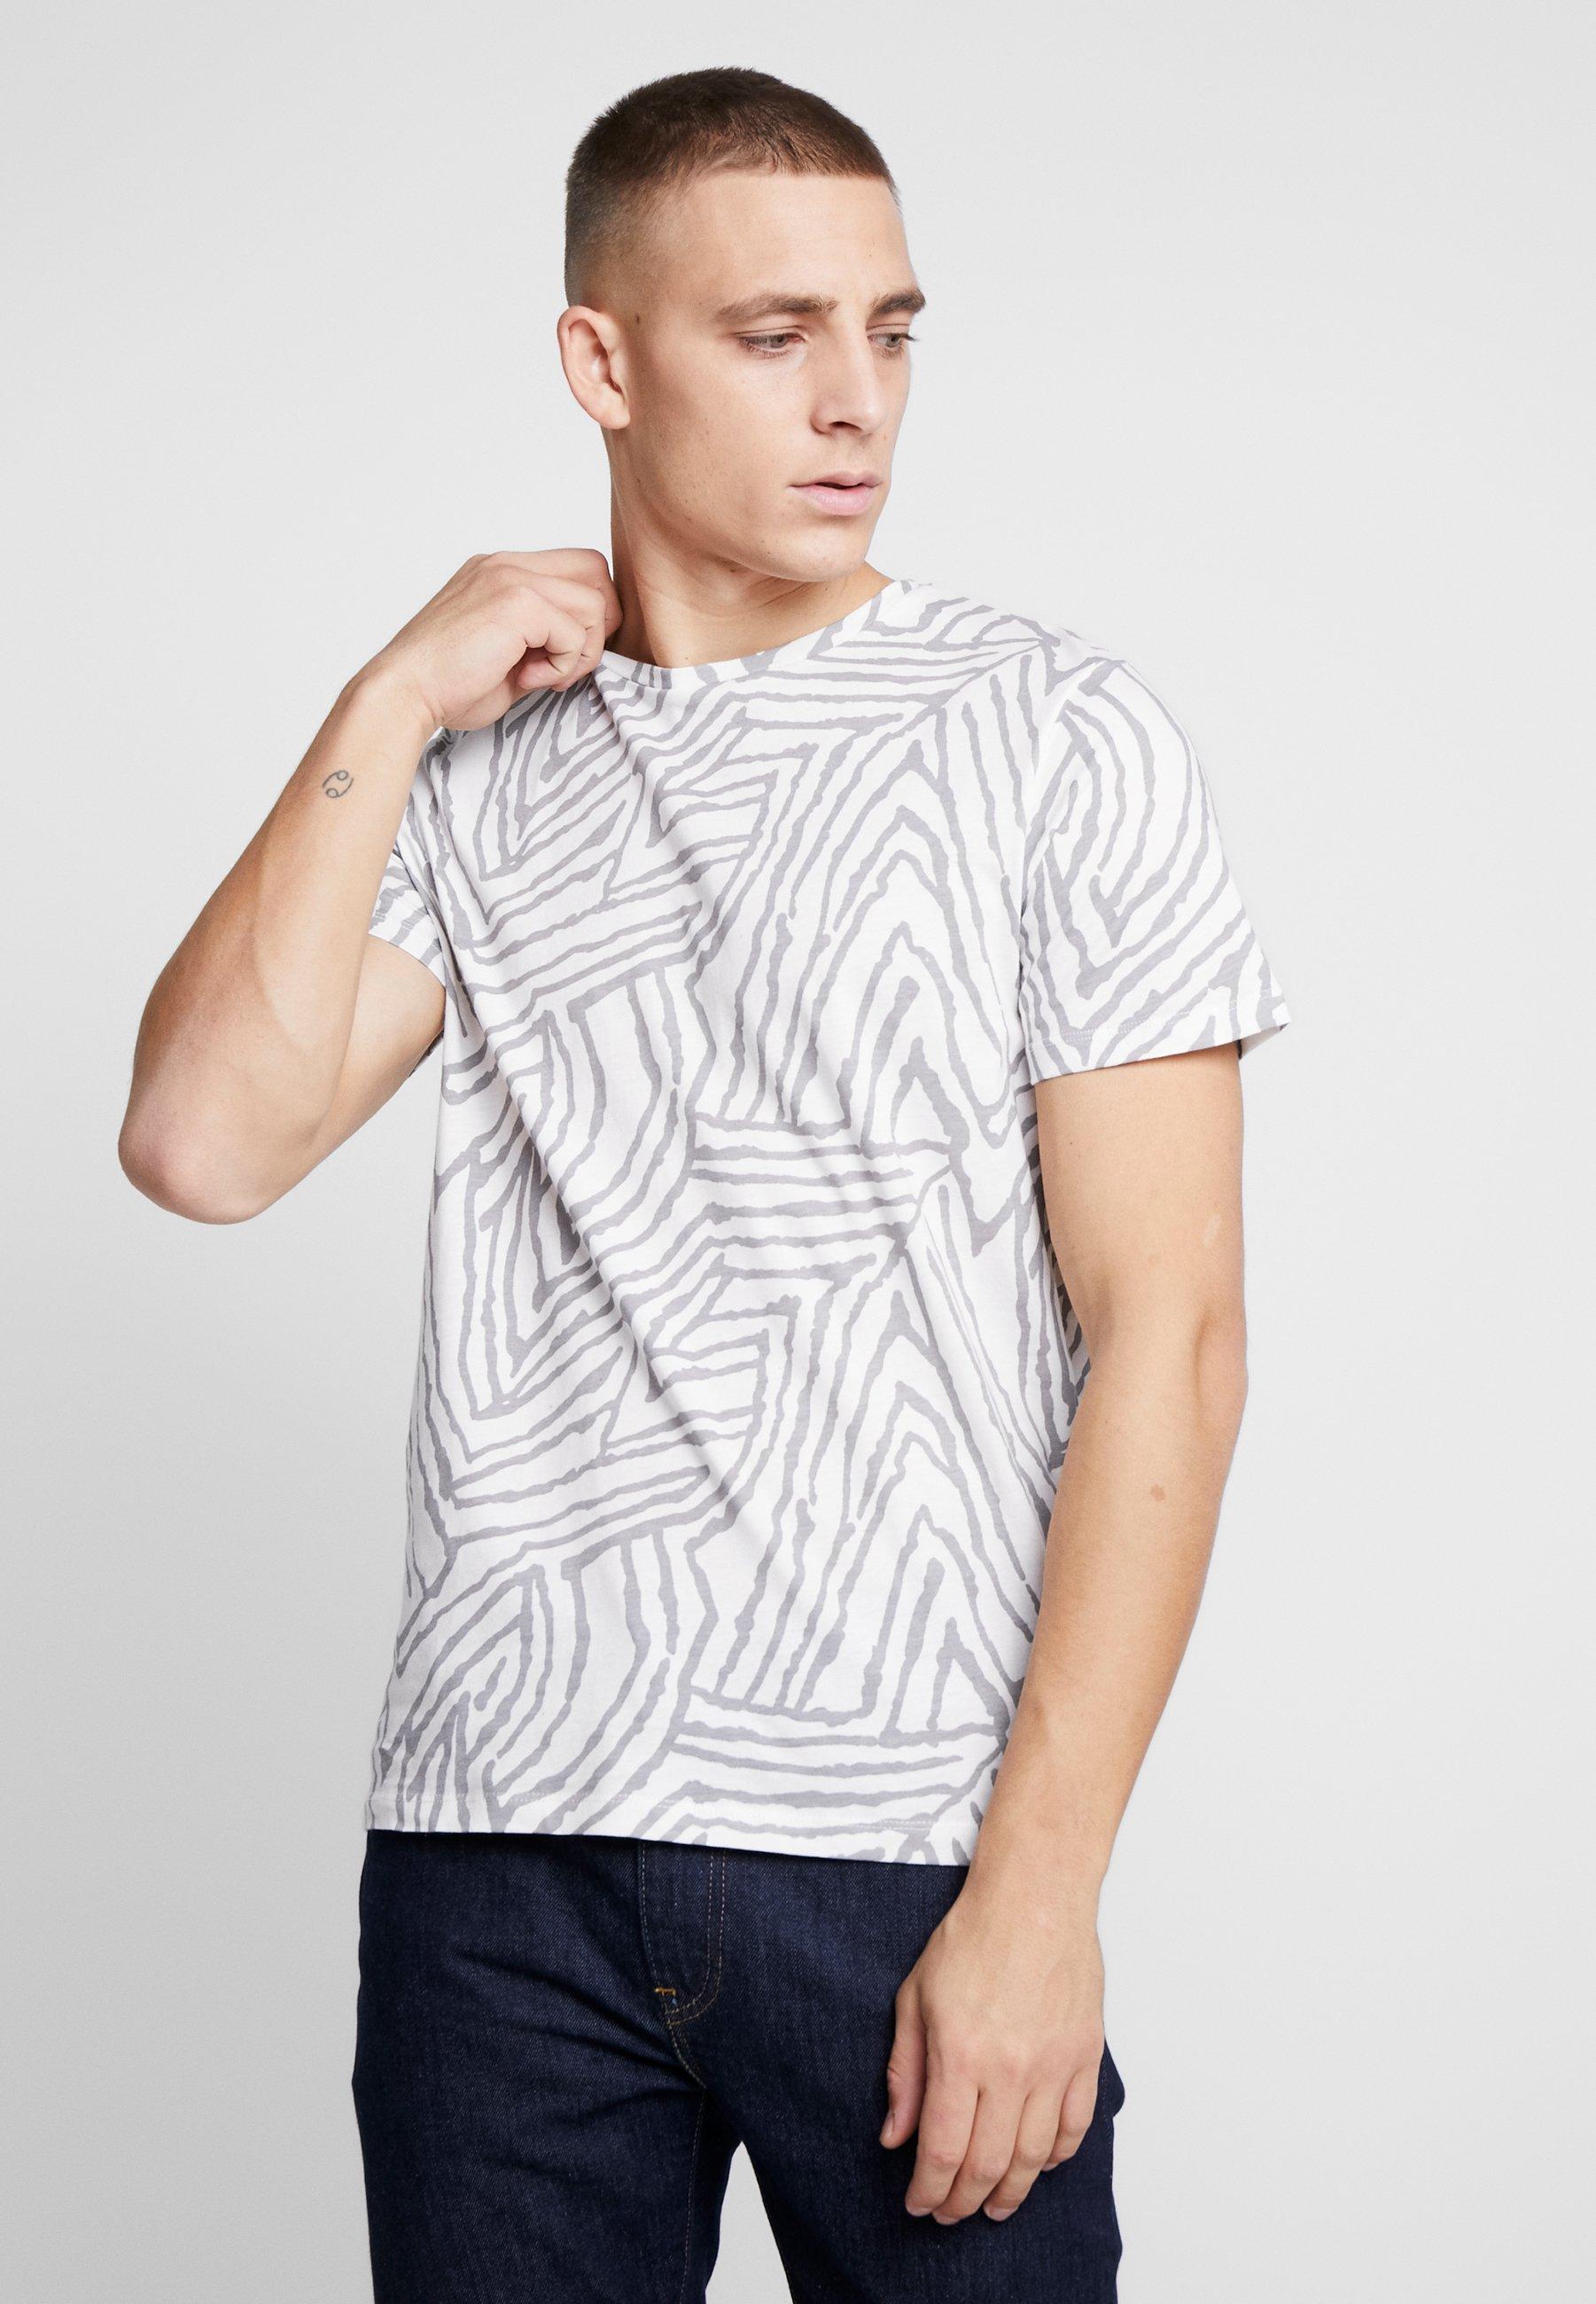 Jackamp; Con Crew Jones Jprsavannah light Tee De Stampa Grey Blanc shirt Melange Blanc Premium NeckT ZXOuPki